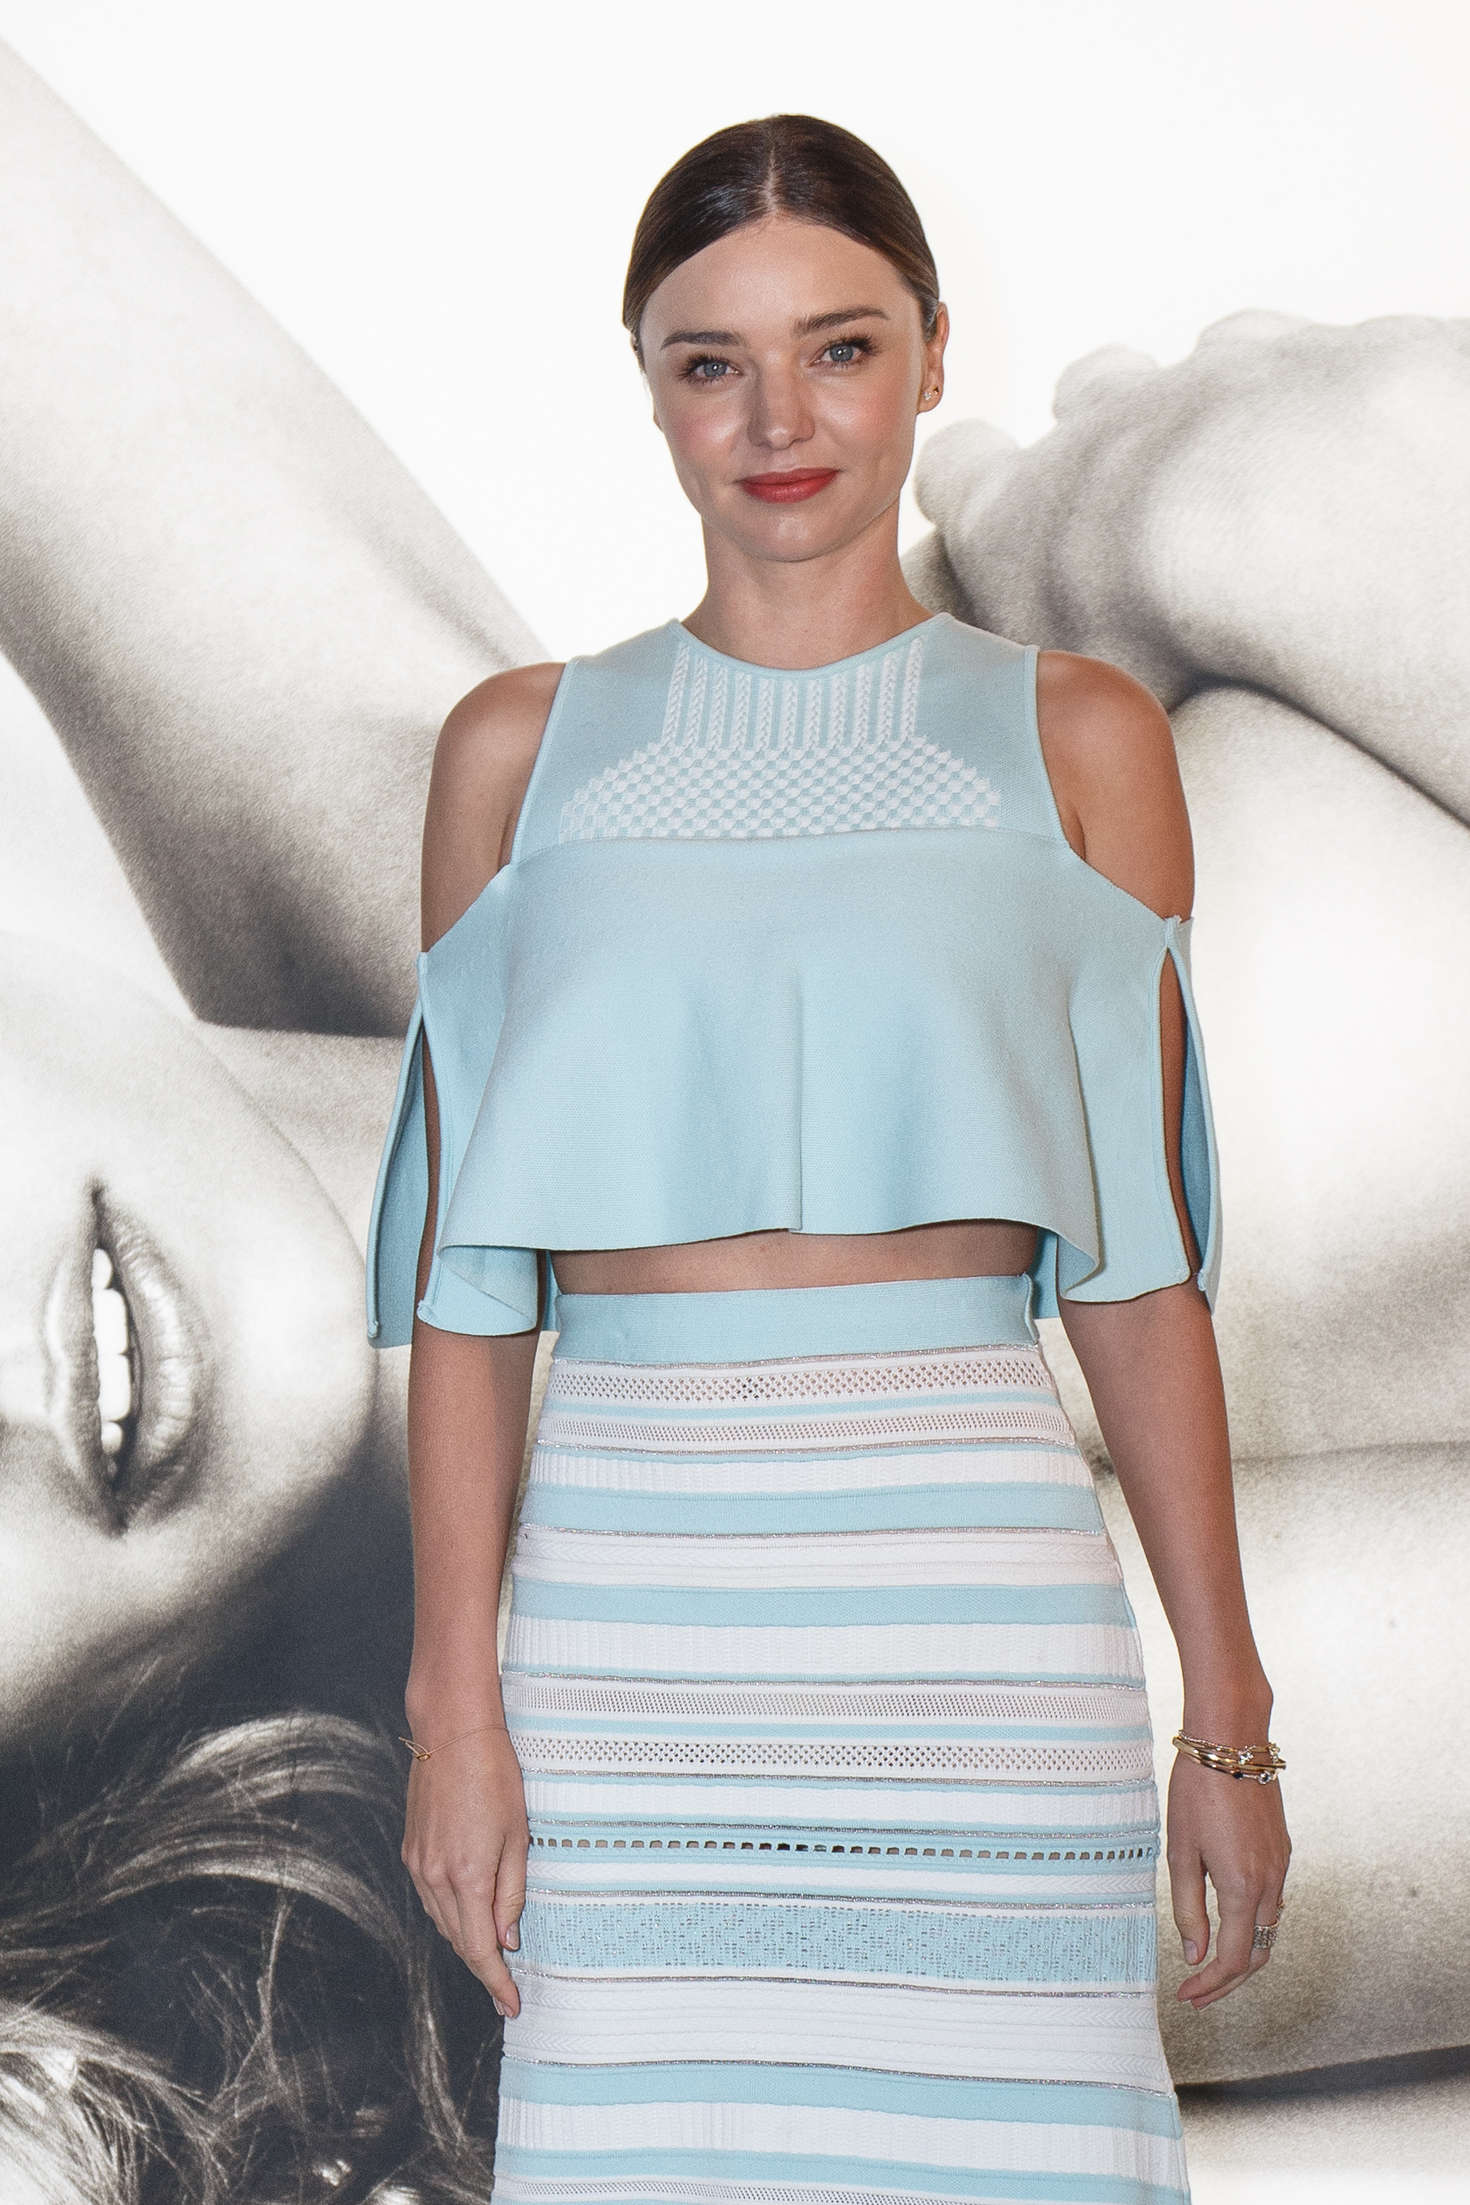 Miranda Kerr - Promotes her KORA Organics skincare products in Sydney